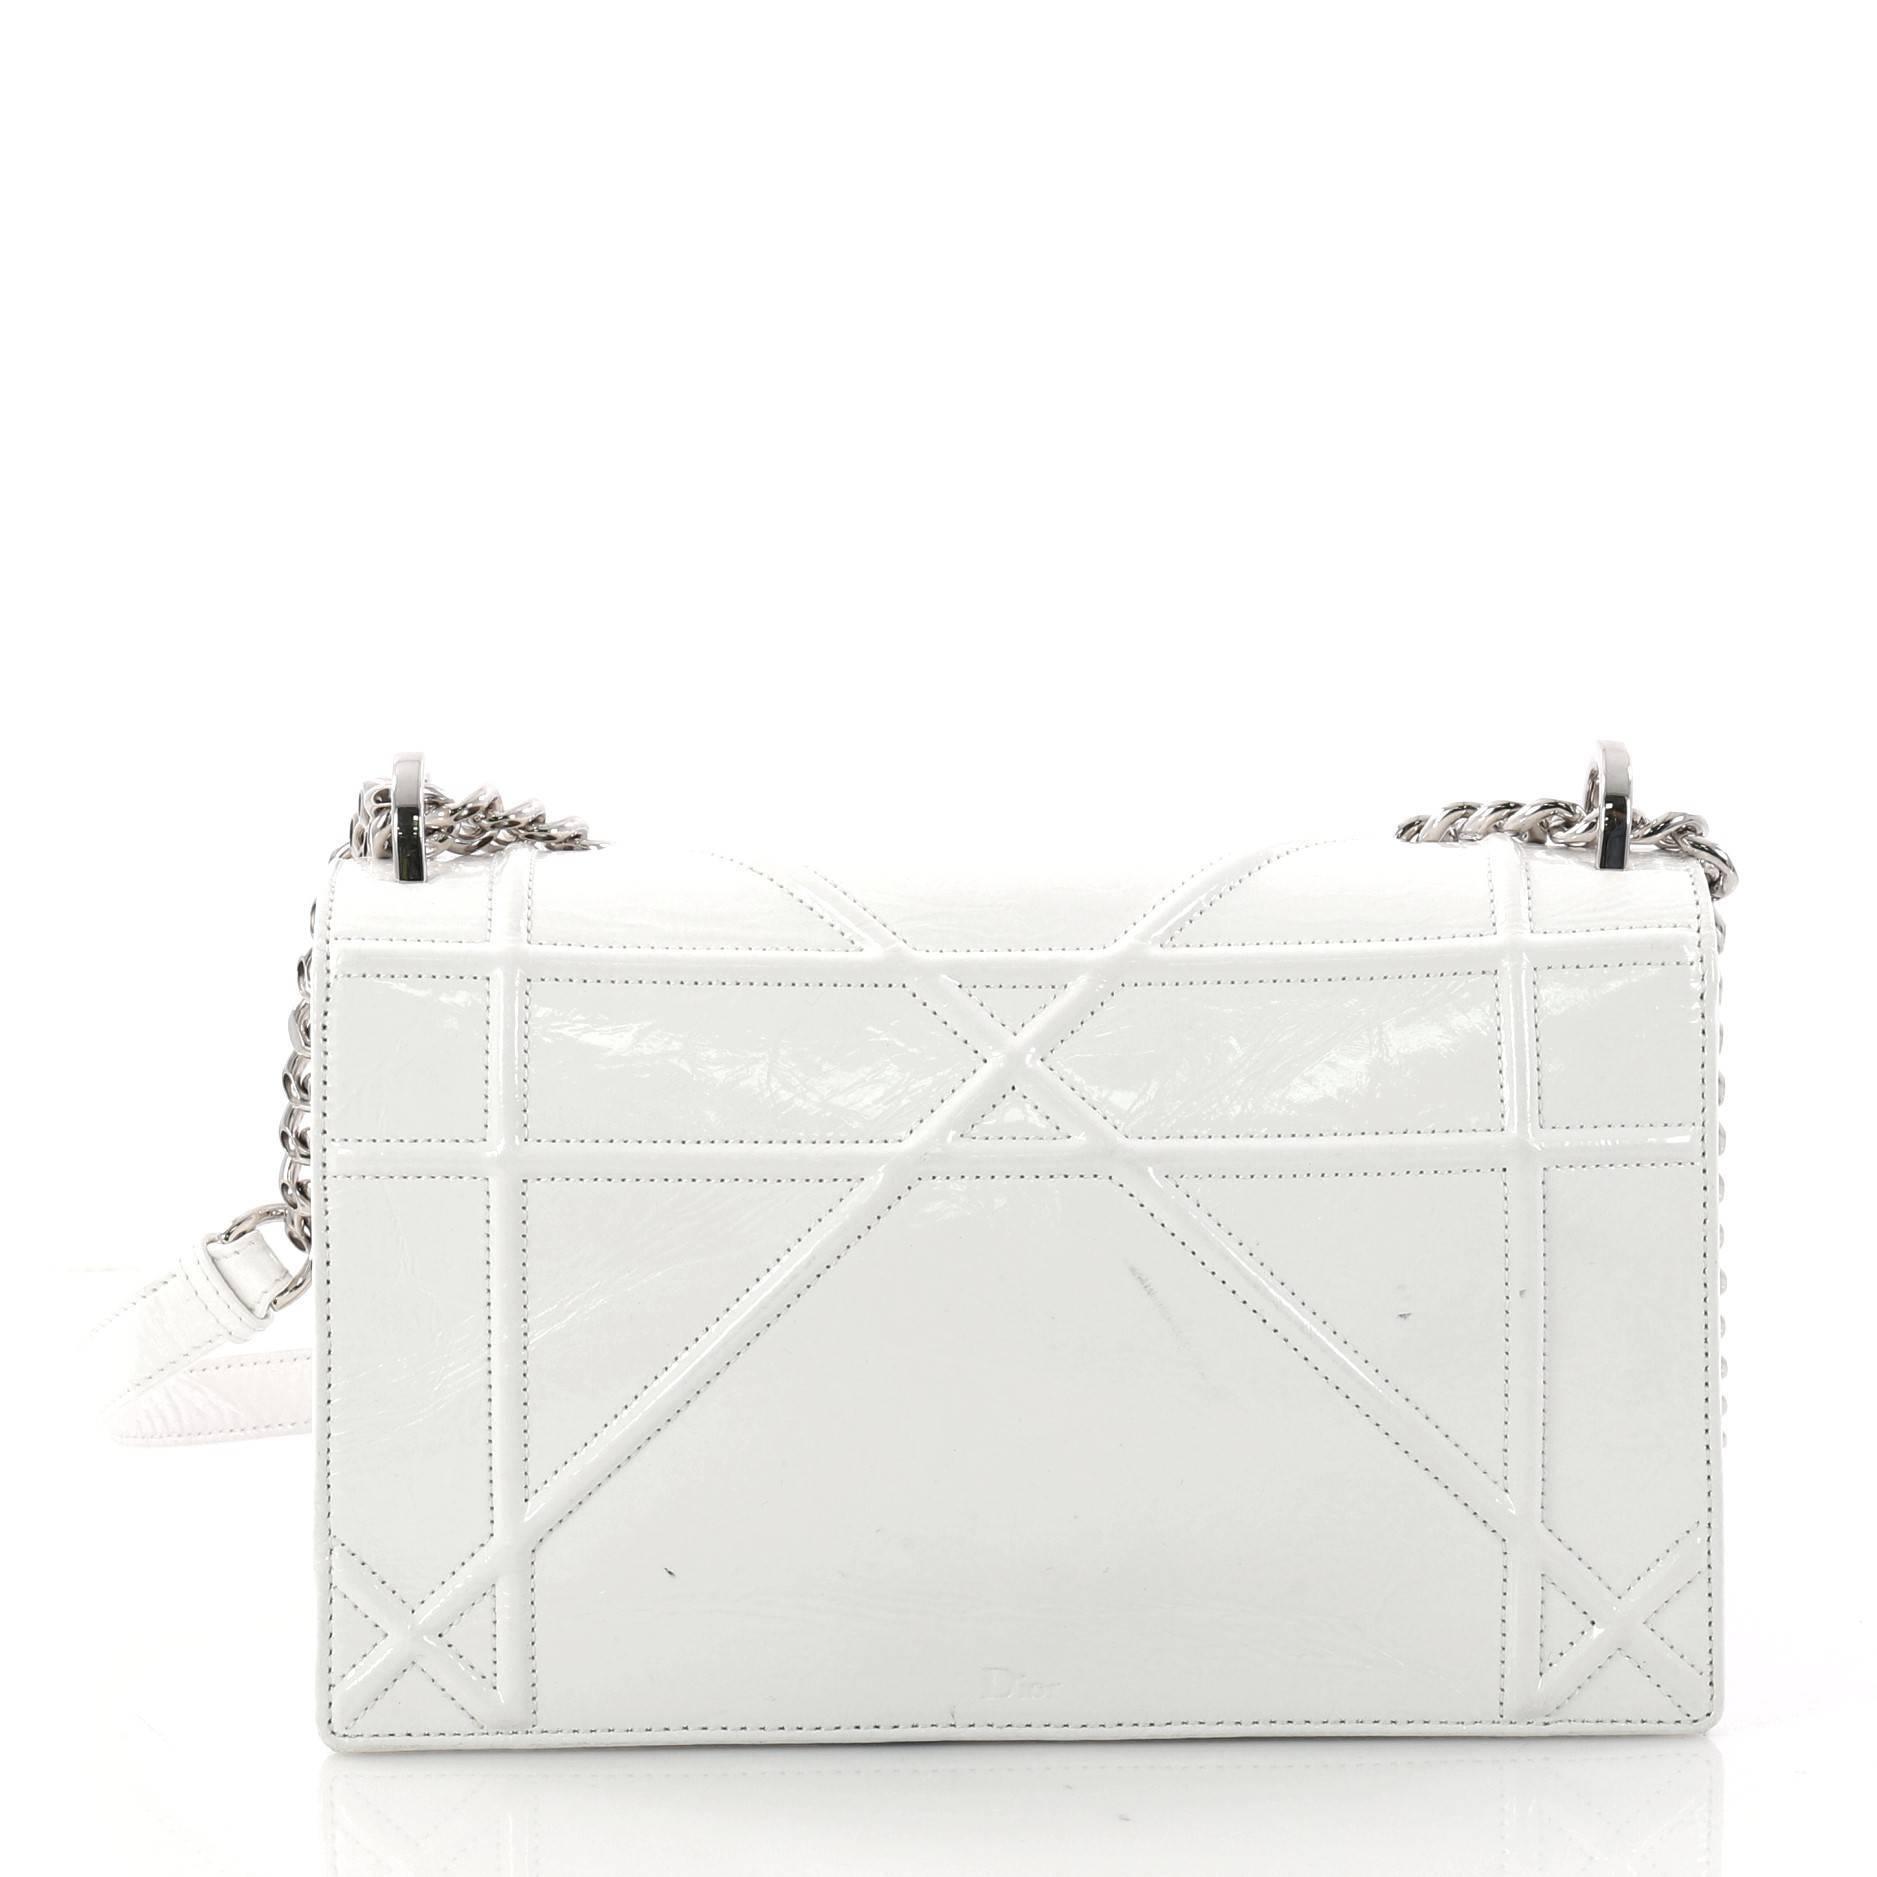 Dior Diorama Clasp Flap Bag Crinkled Lambskin Medium 3vSwy